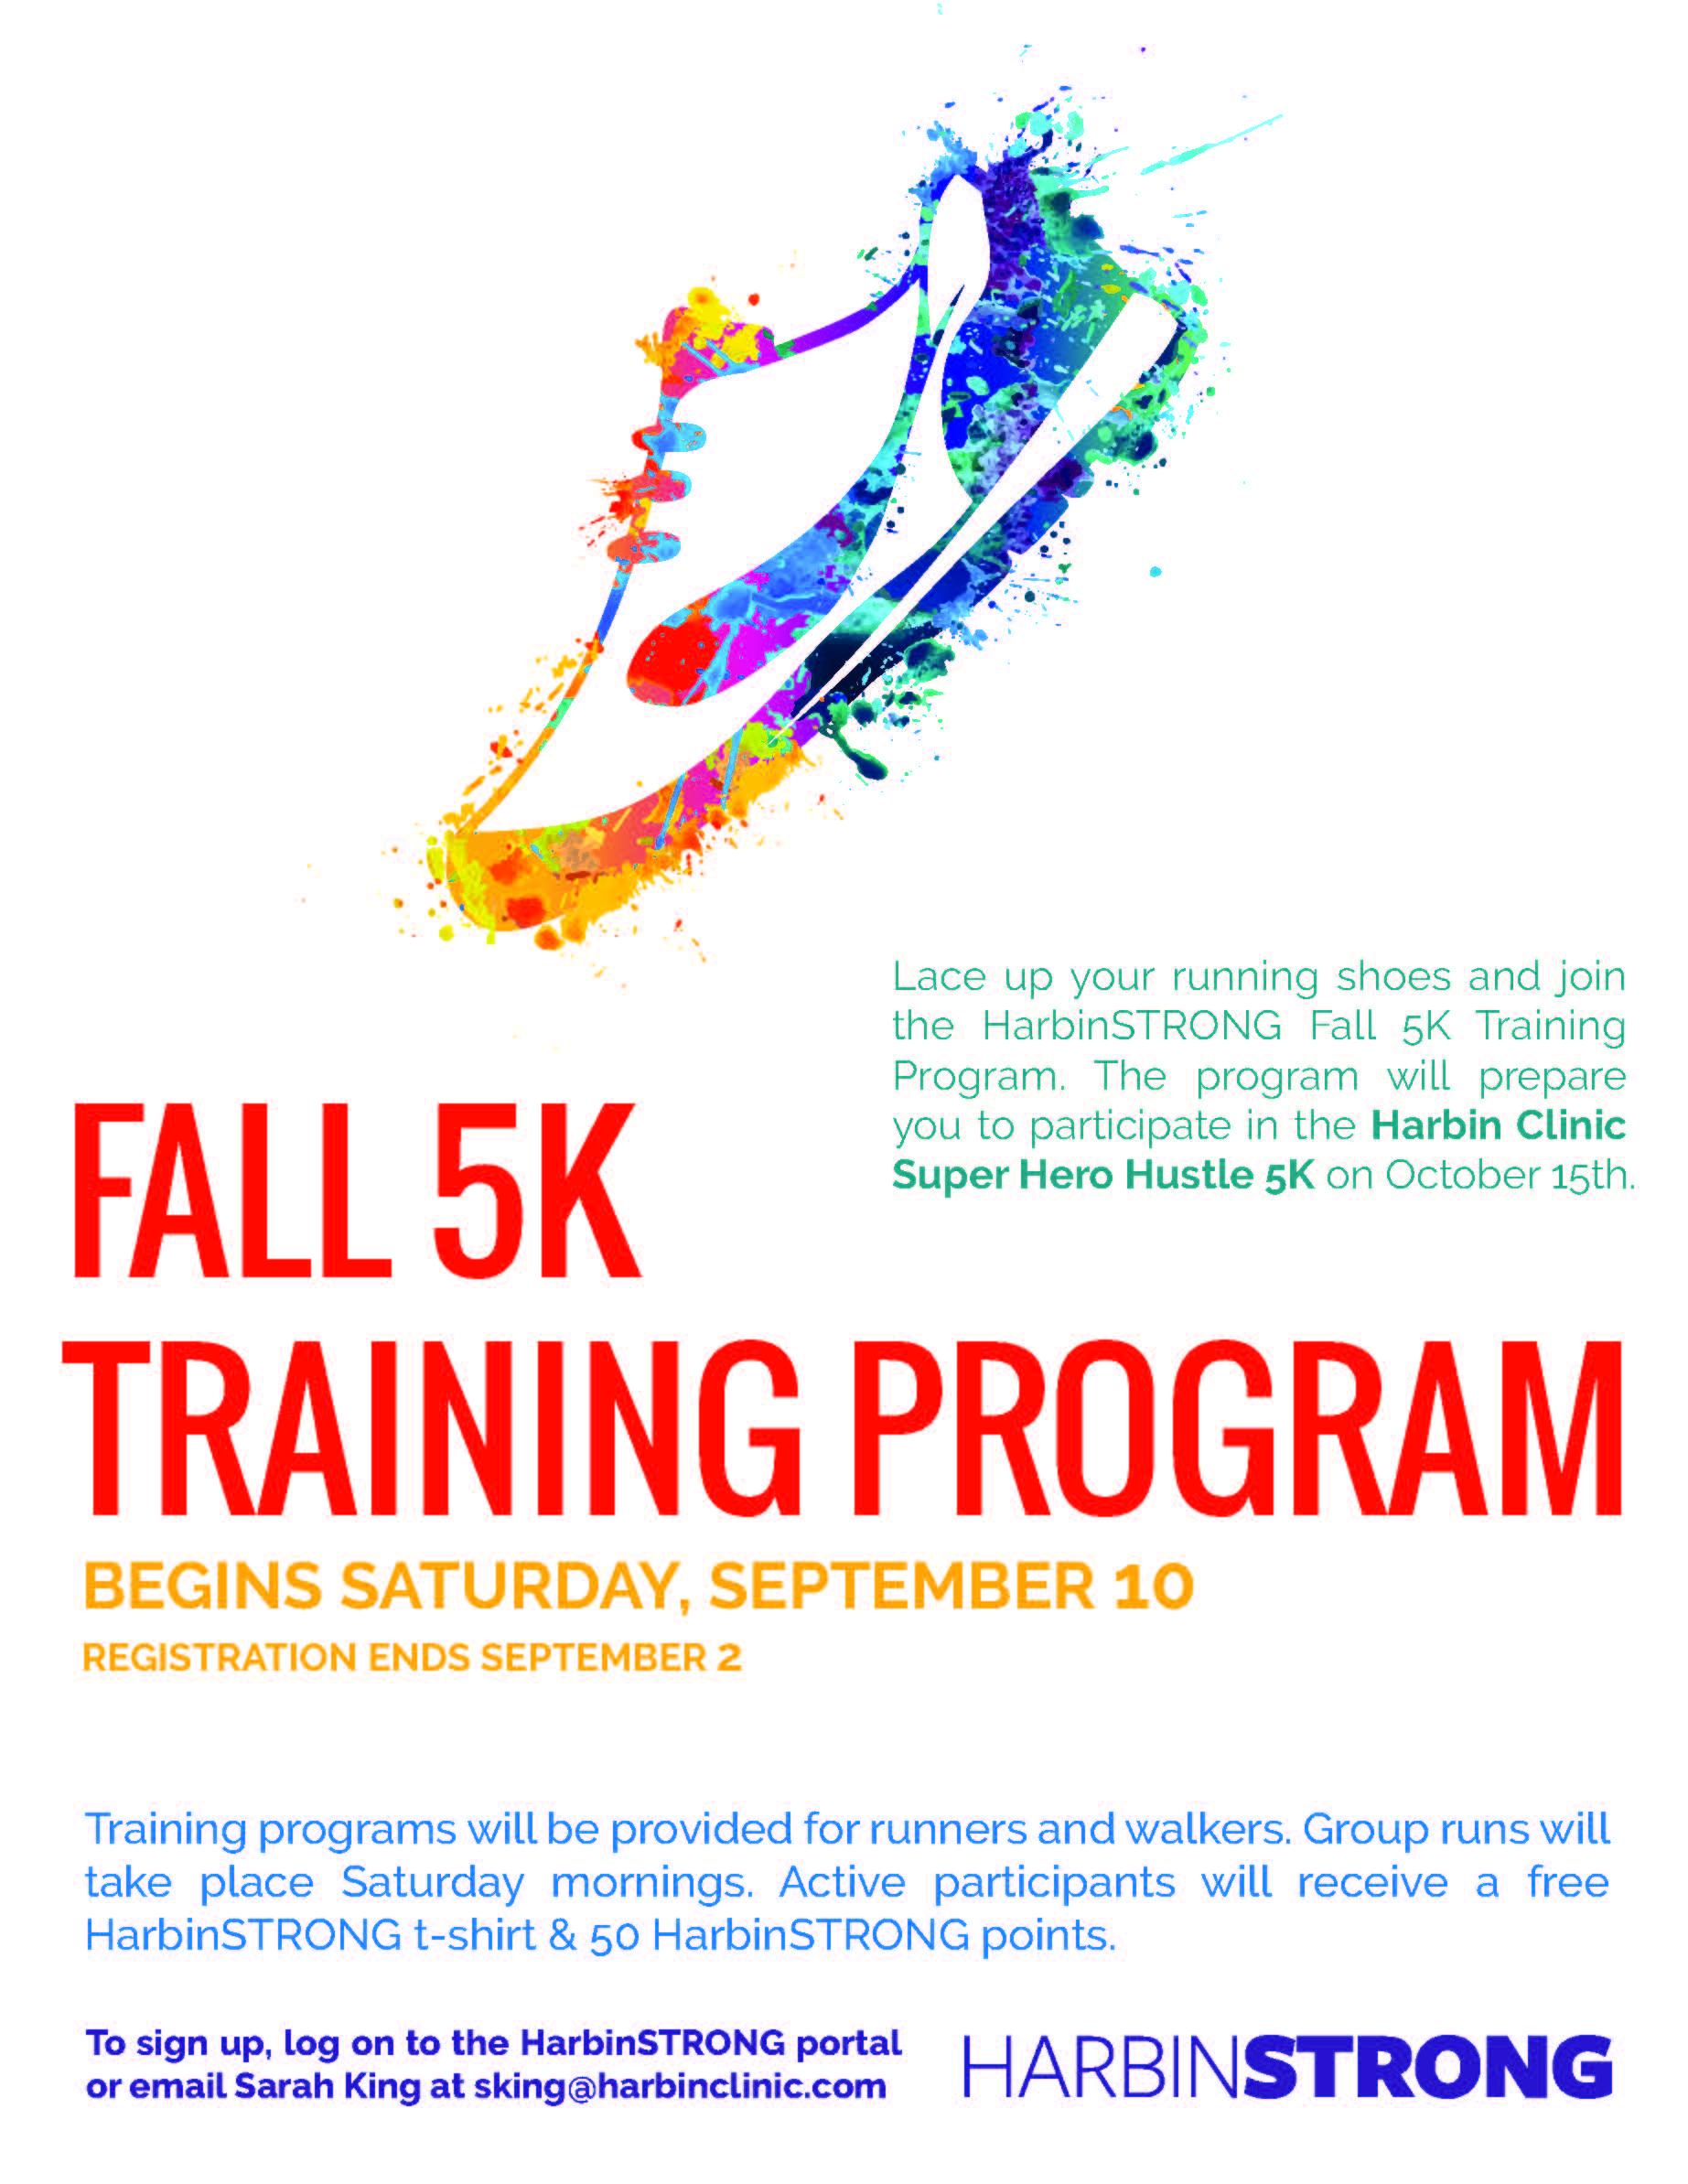 Fall 5K training flyer